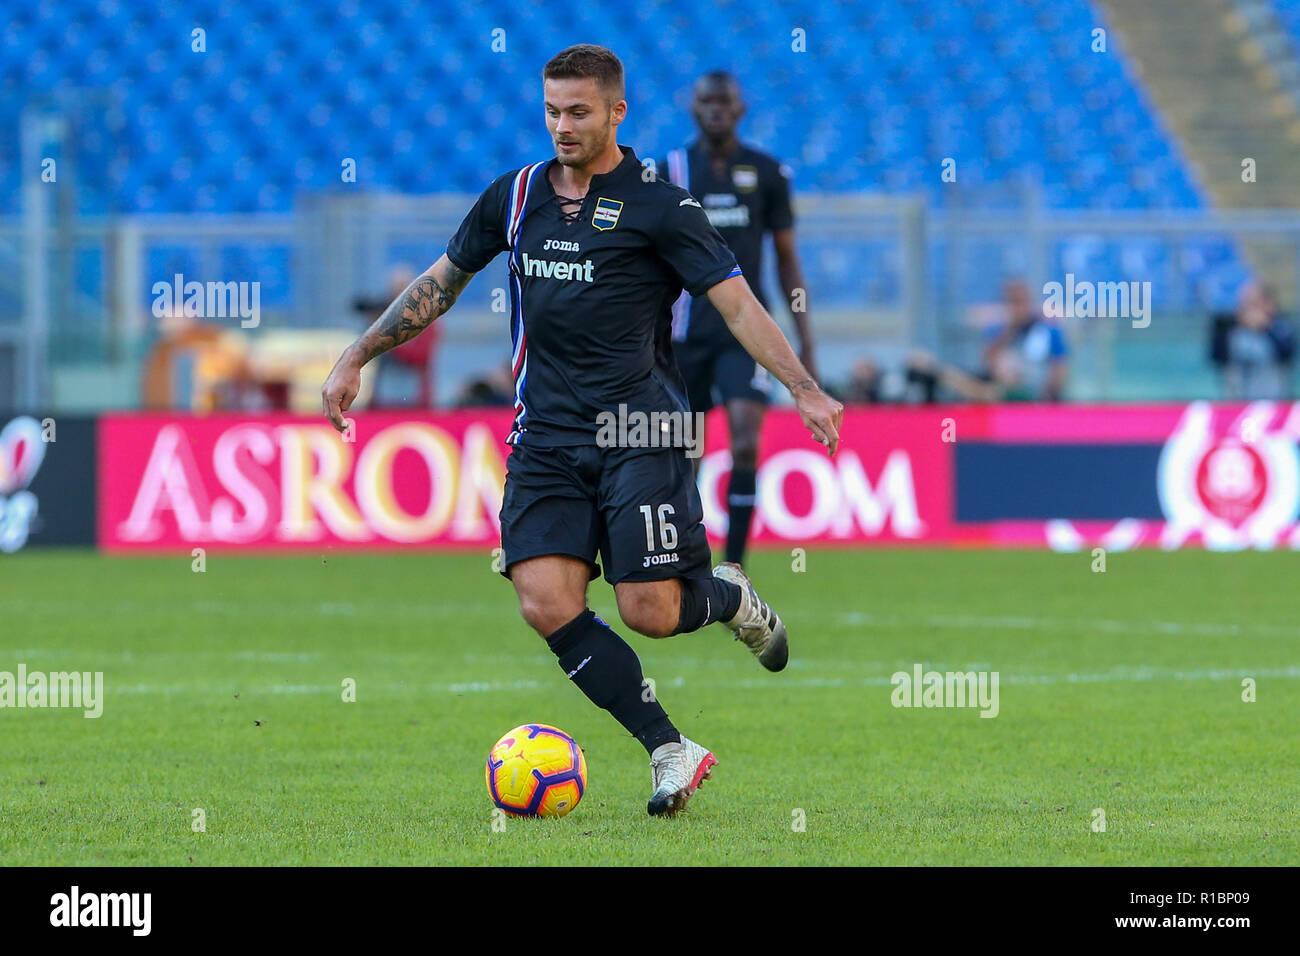 11th November 2018, Stadio Olimpico, Rome, Italy; Serie A Football, Roma versus Sampdoria; Karol Linetty of Sampdoria controls the ball as he breaks forward Stock Photo